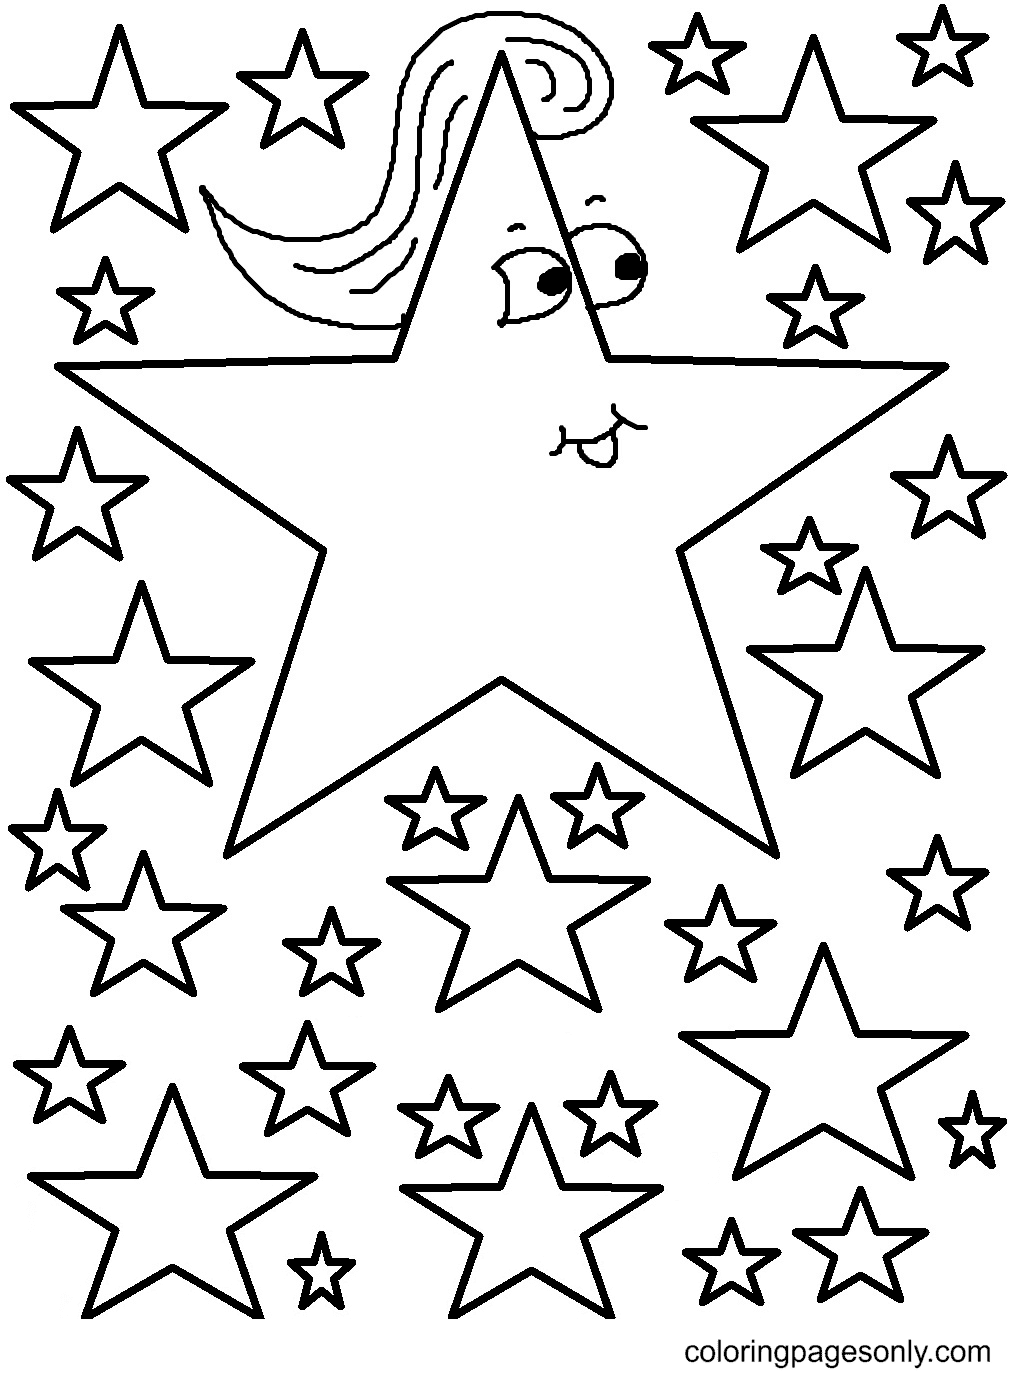 Unique Star Coloring Page